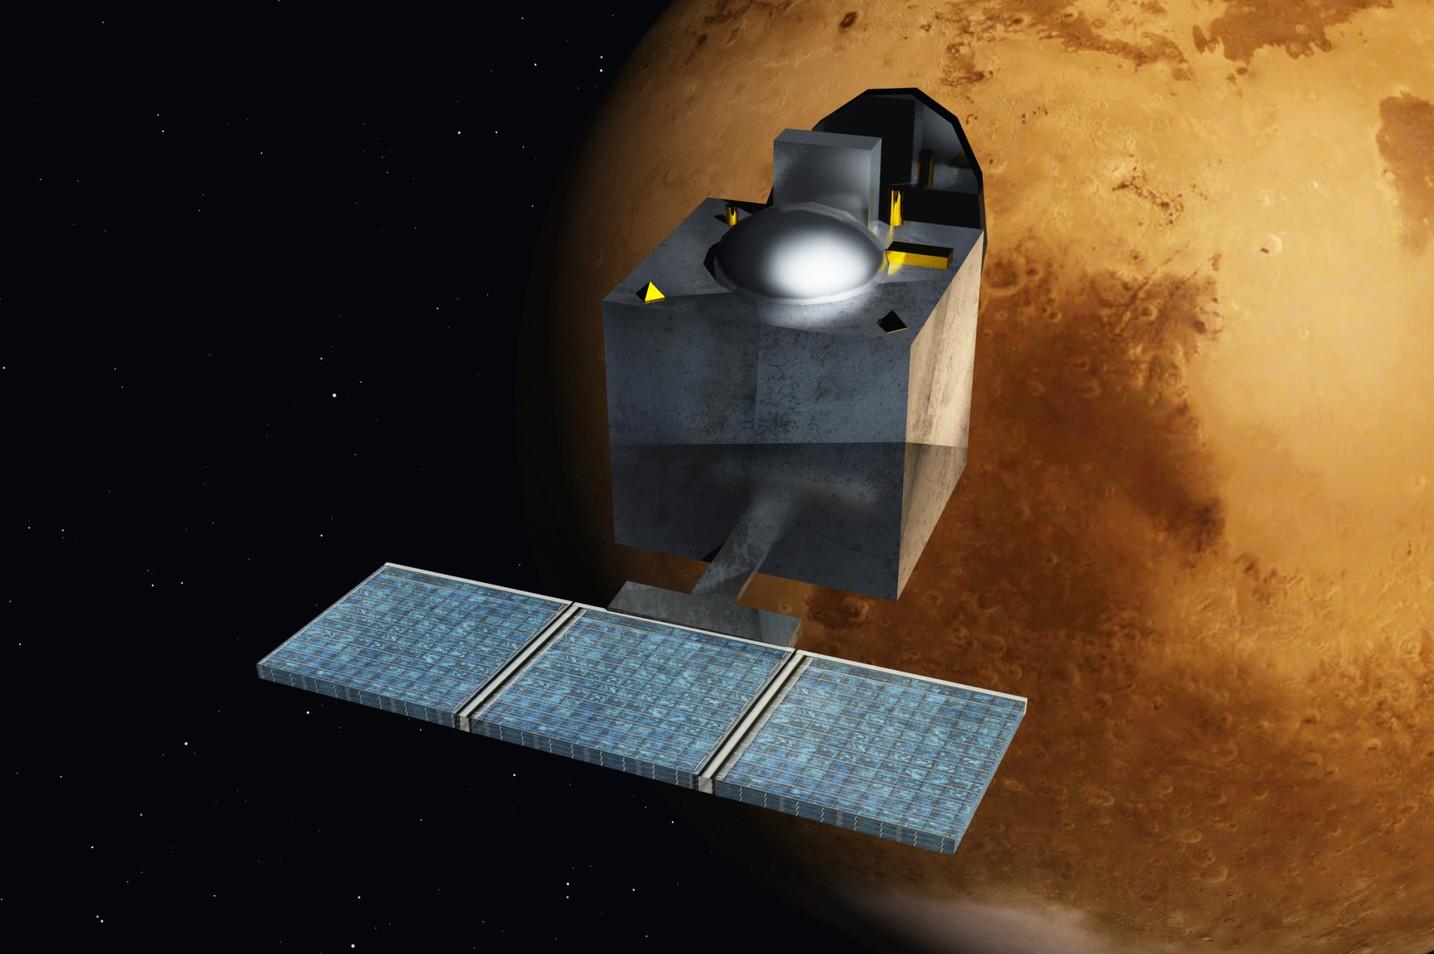 2014 - Mangalyaan enters Martian orbit